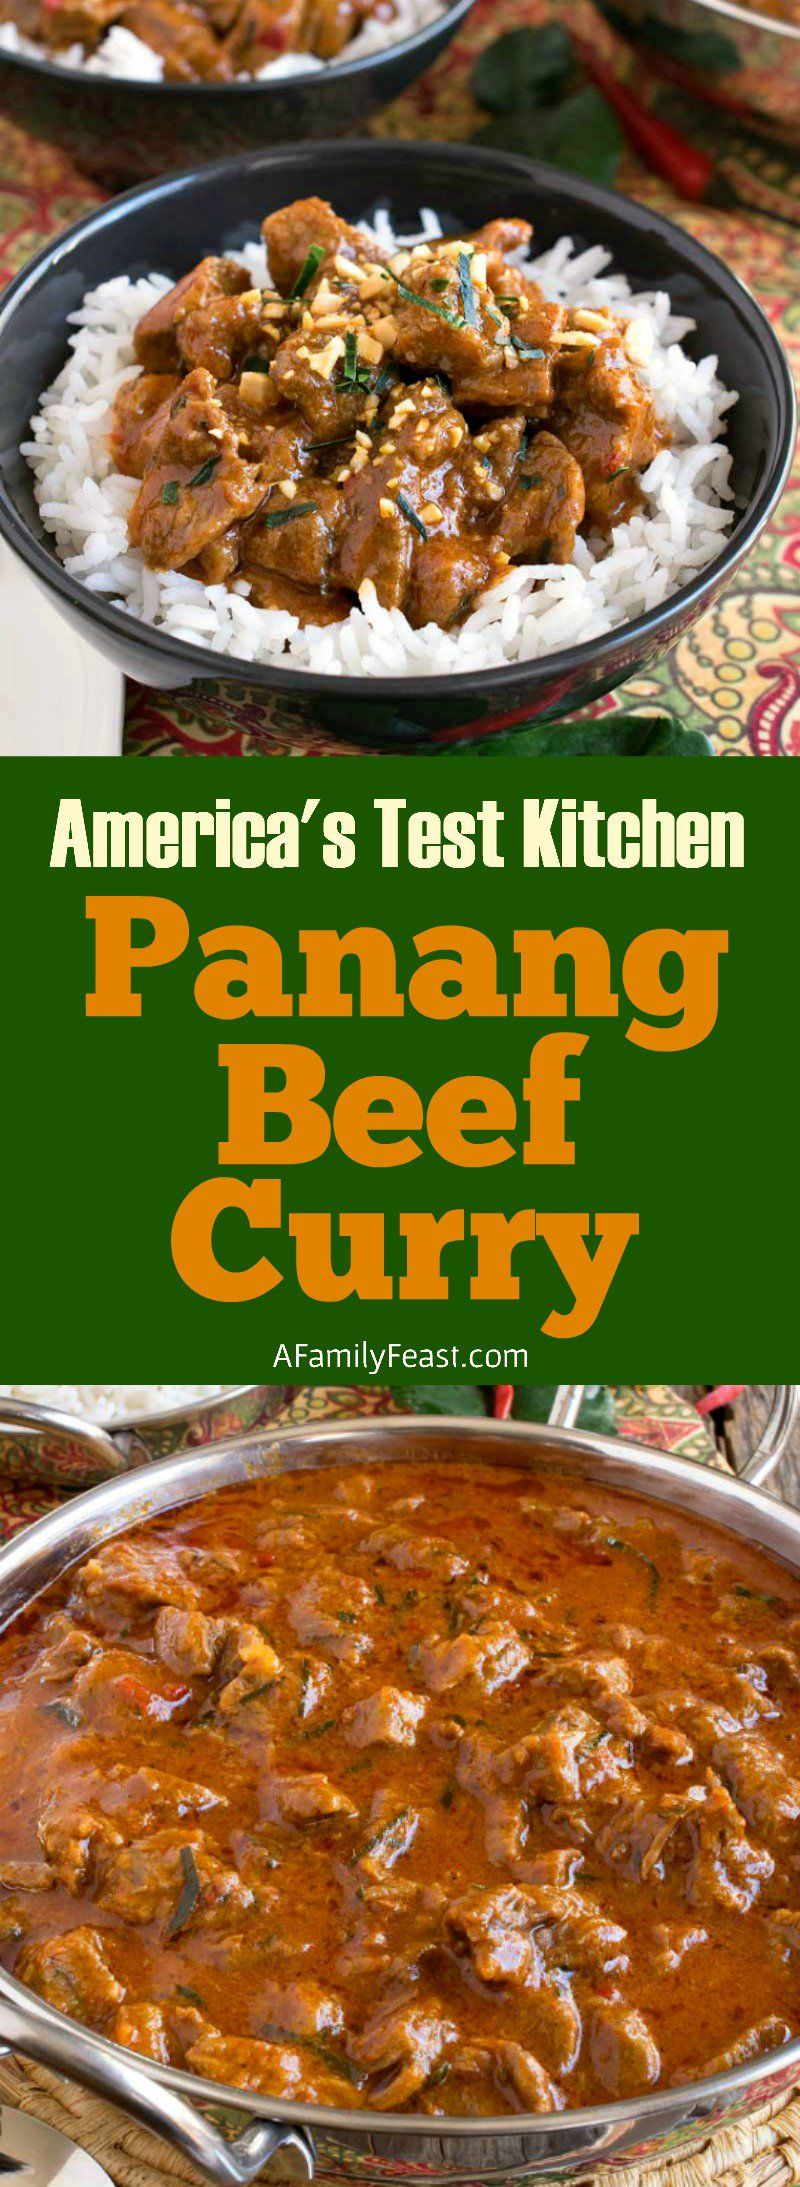 Panang Curry Beef Recipe